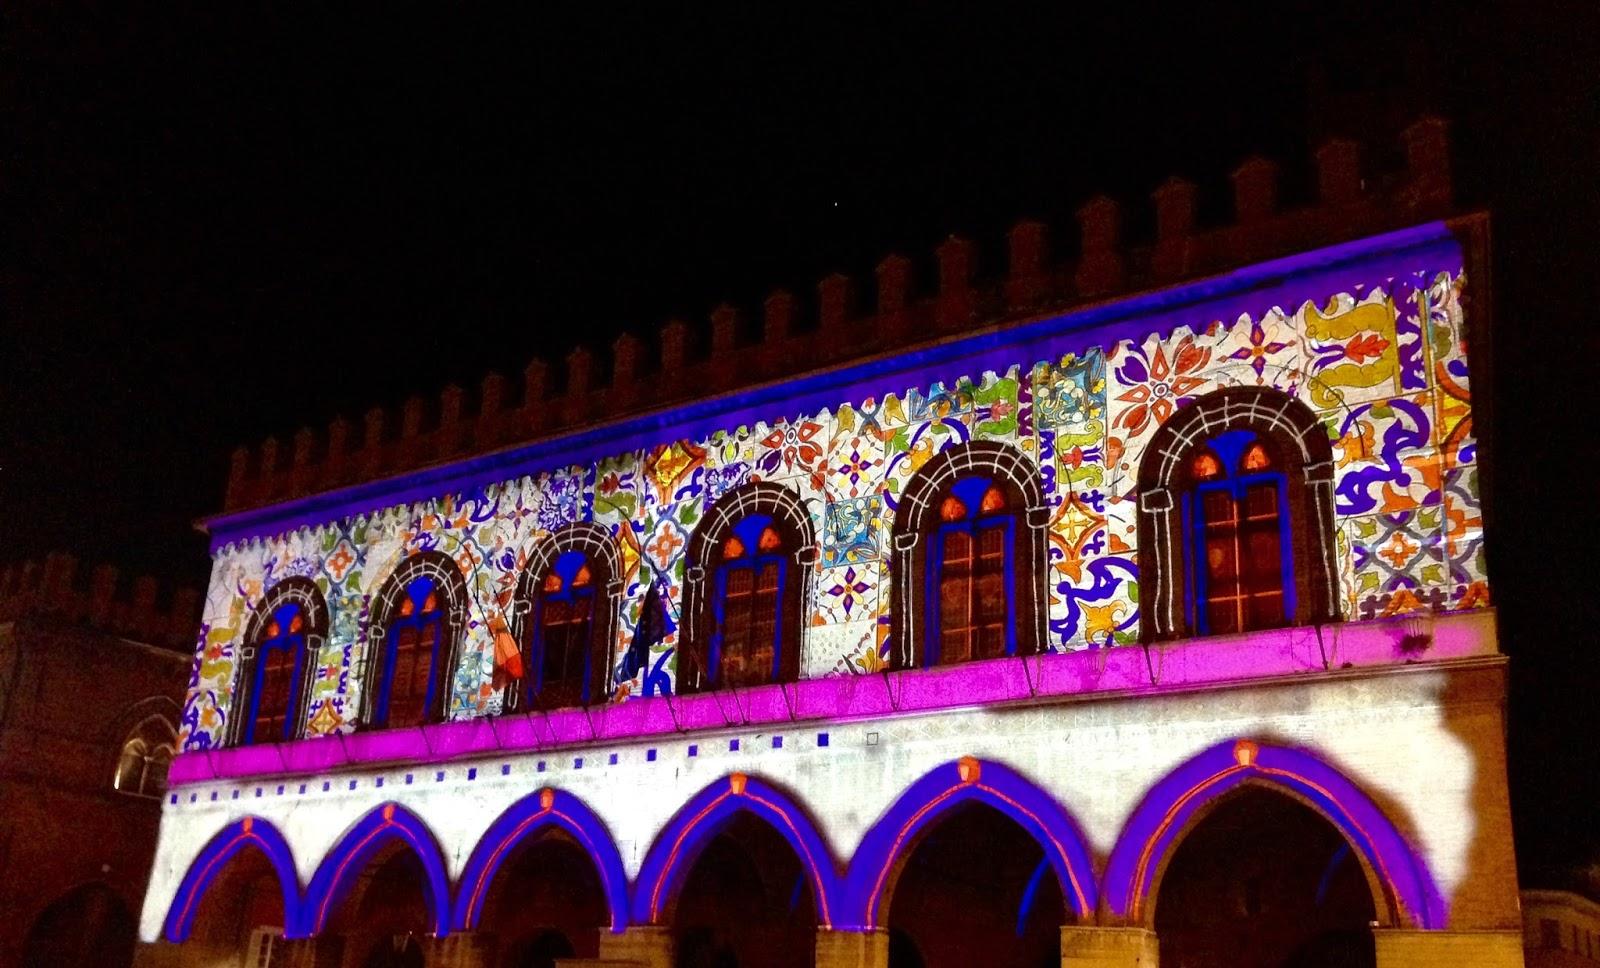 Tecnight Cremona Dipingere Con La Luce Live Painting